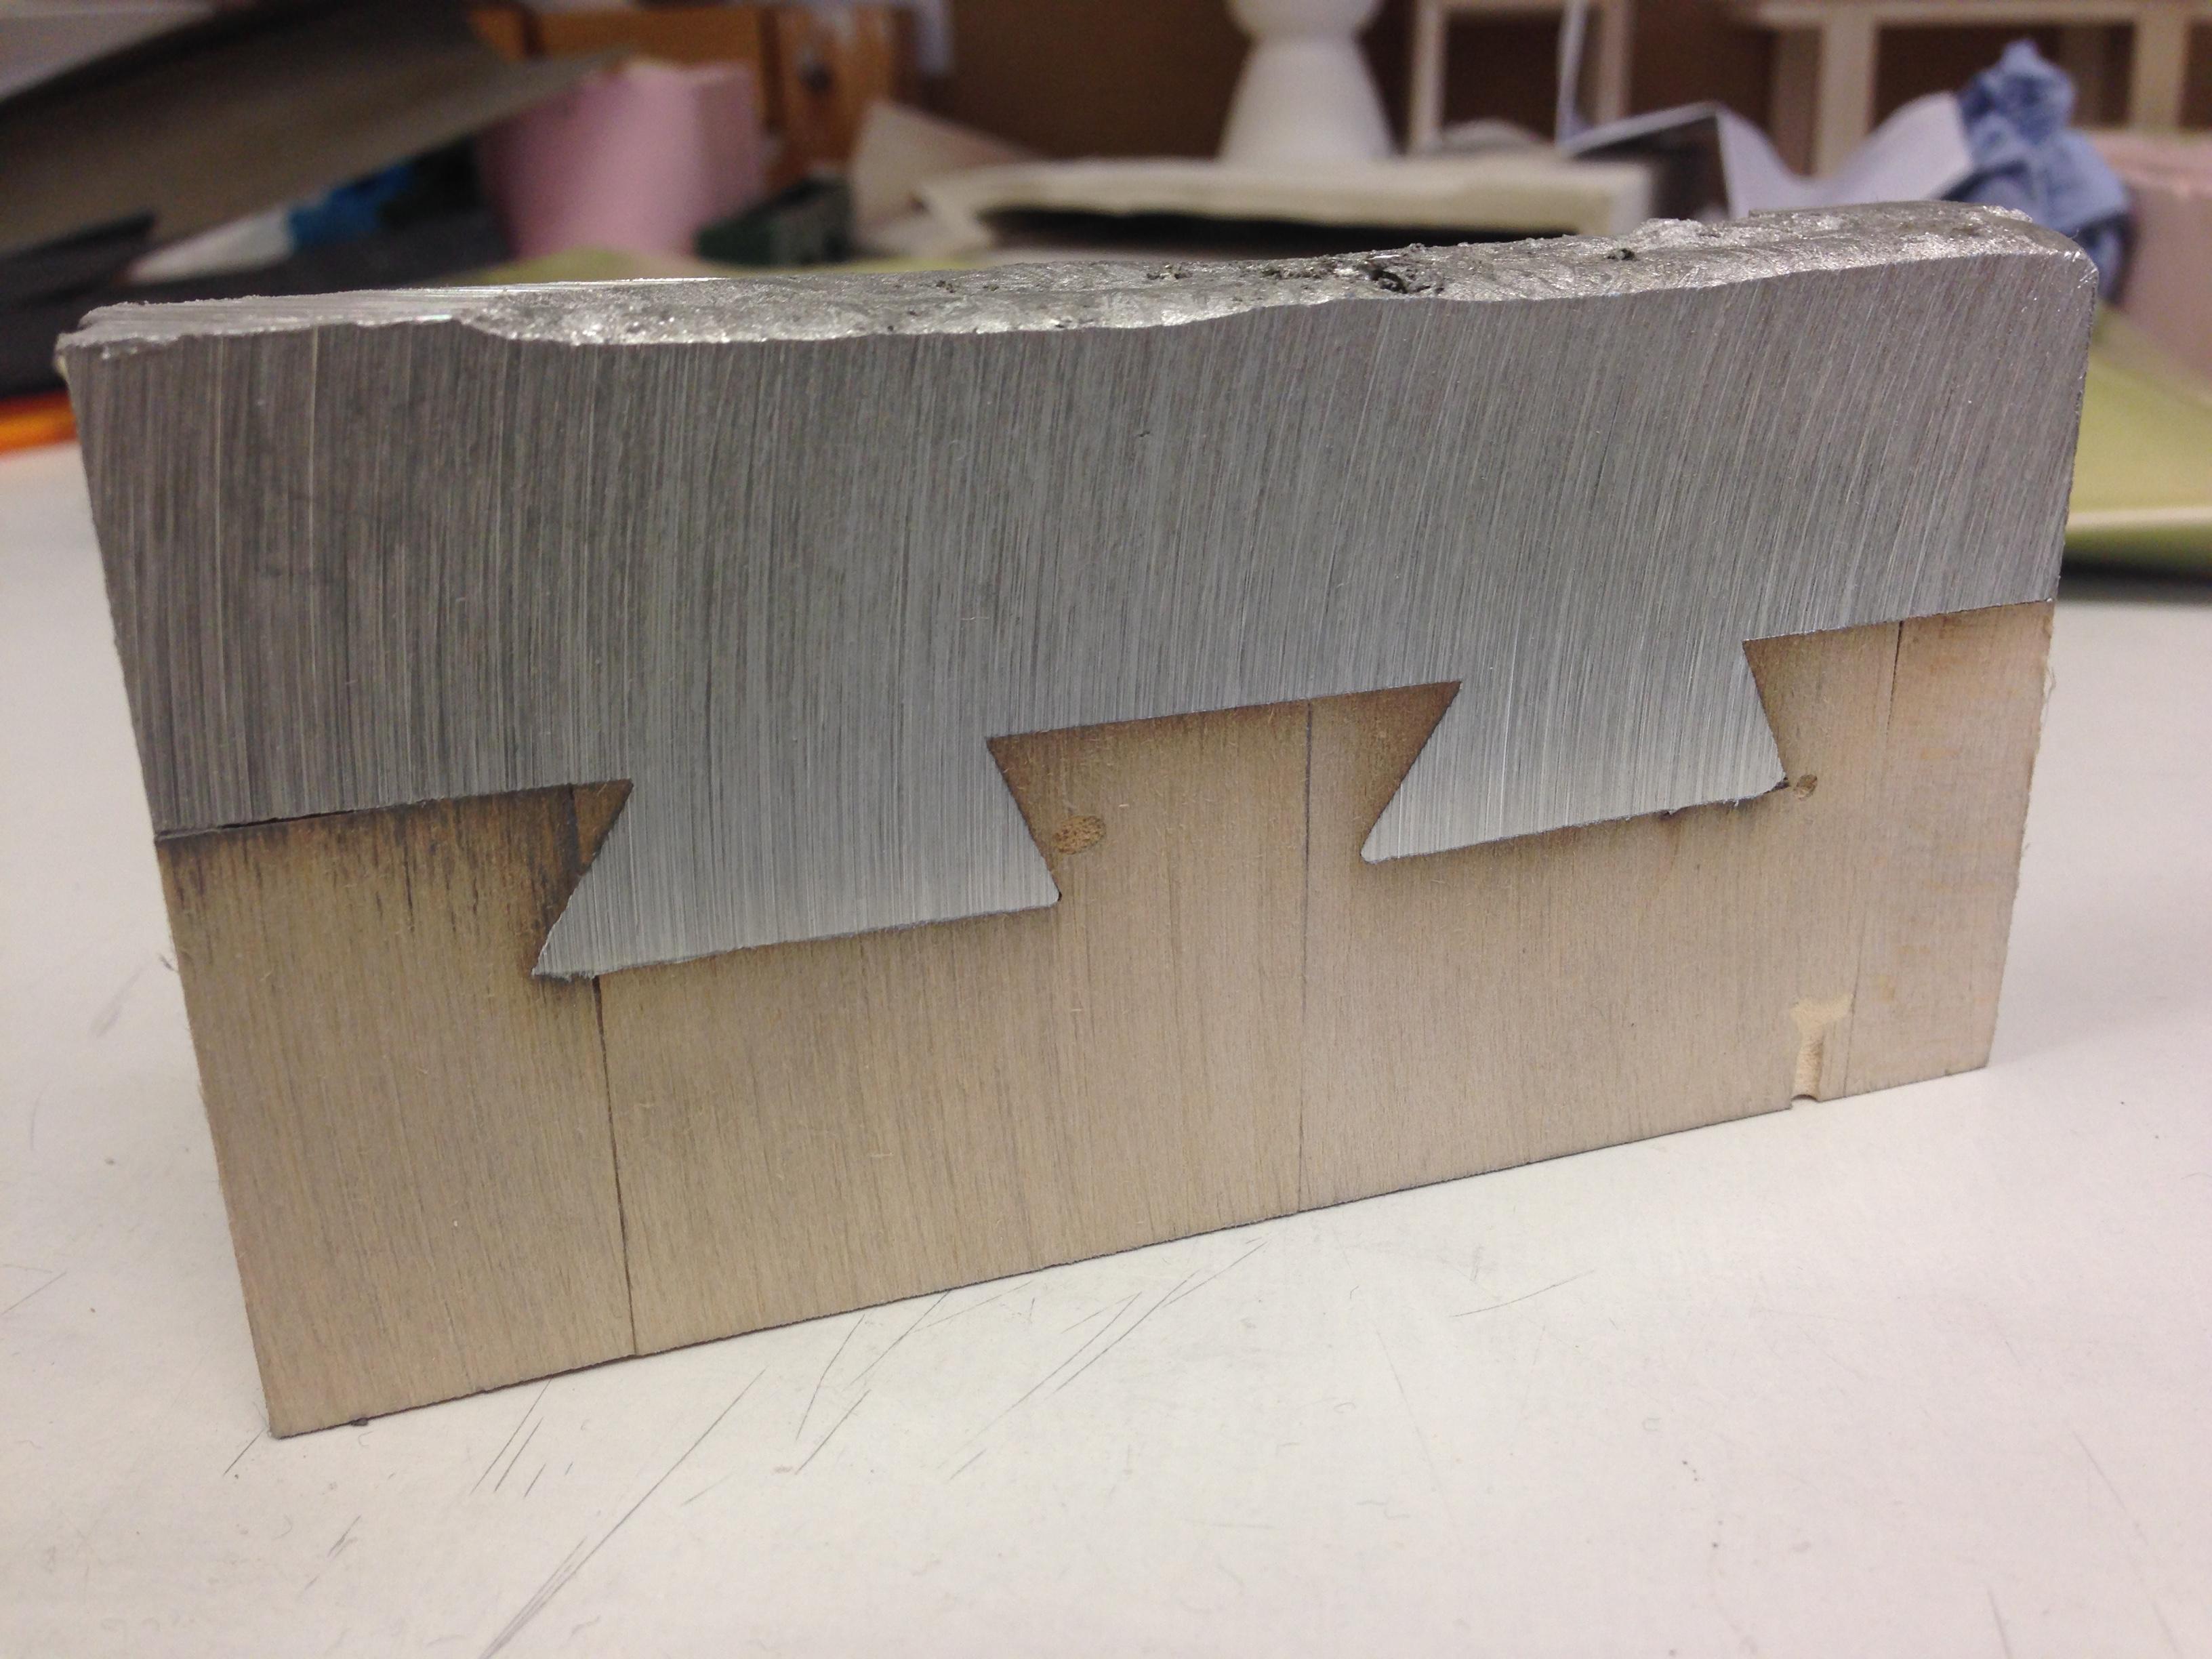 Joining wood and metal  kerrysmakerblog